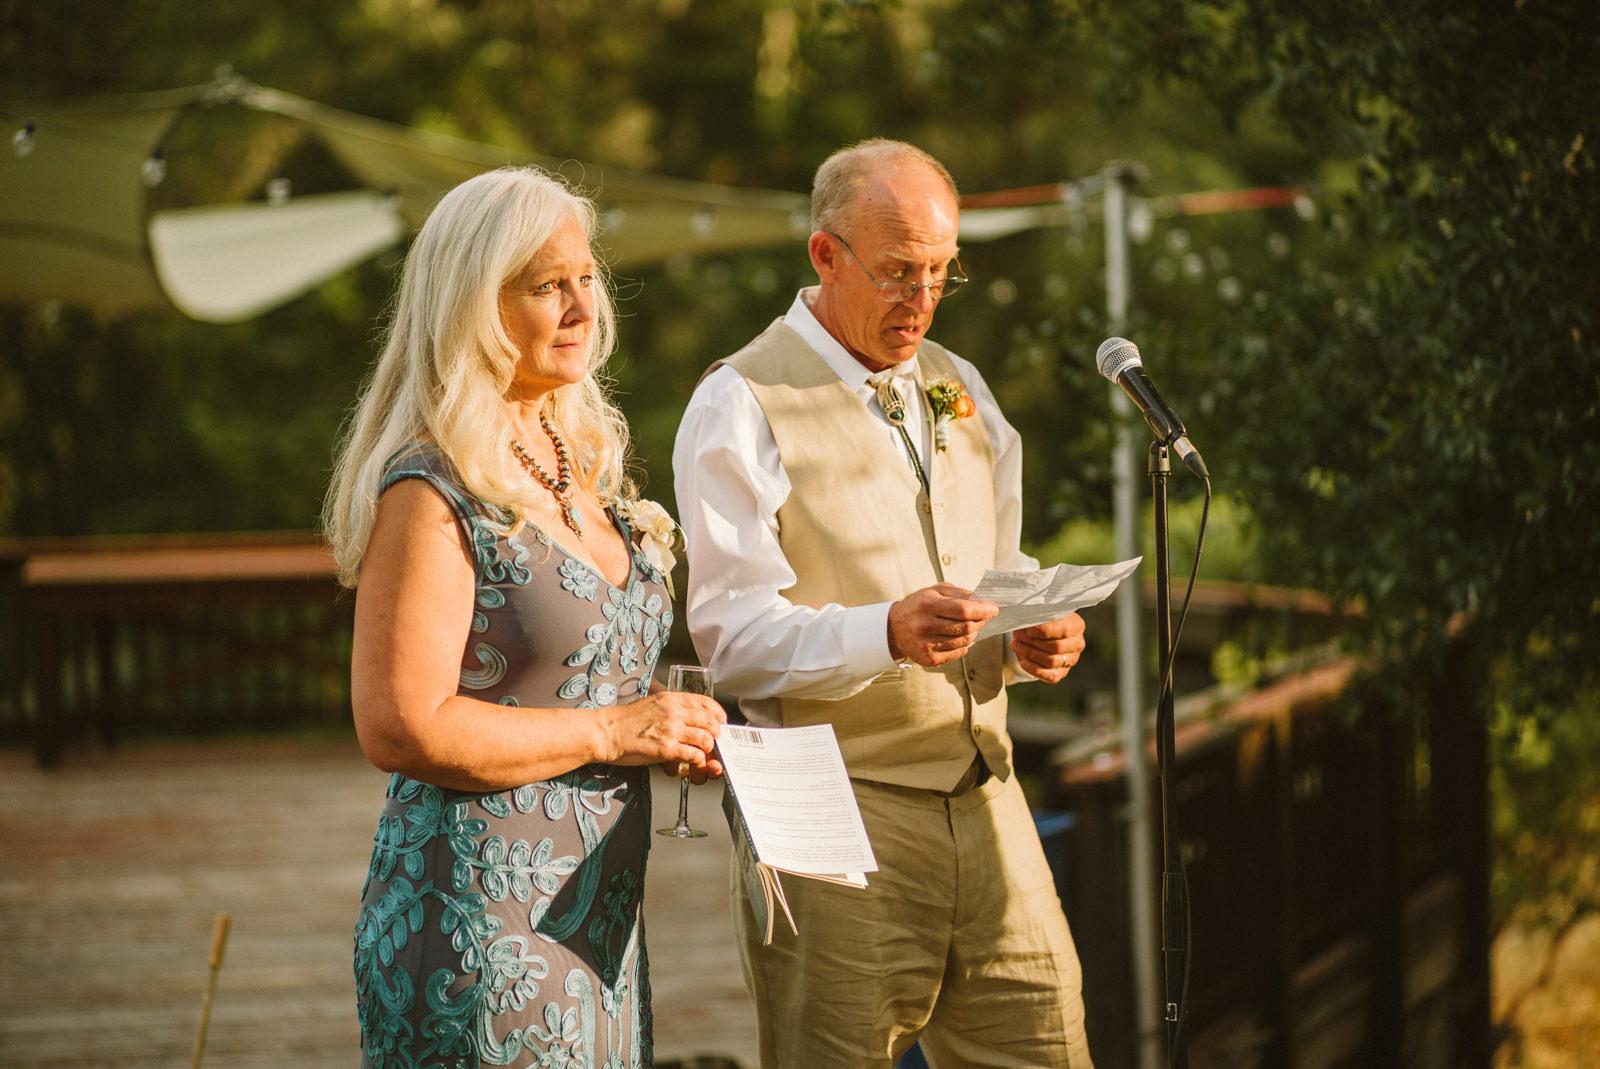 rivers-bend-retreat-wedding-075 RIVER'S BEND RETREAT WEDDING